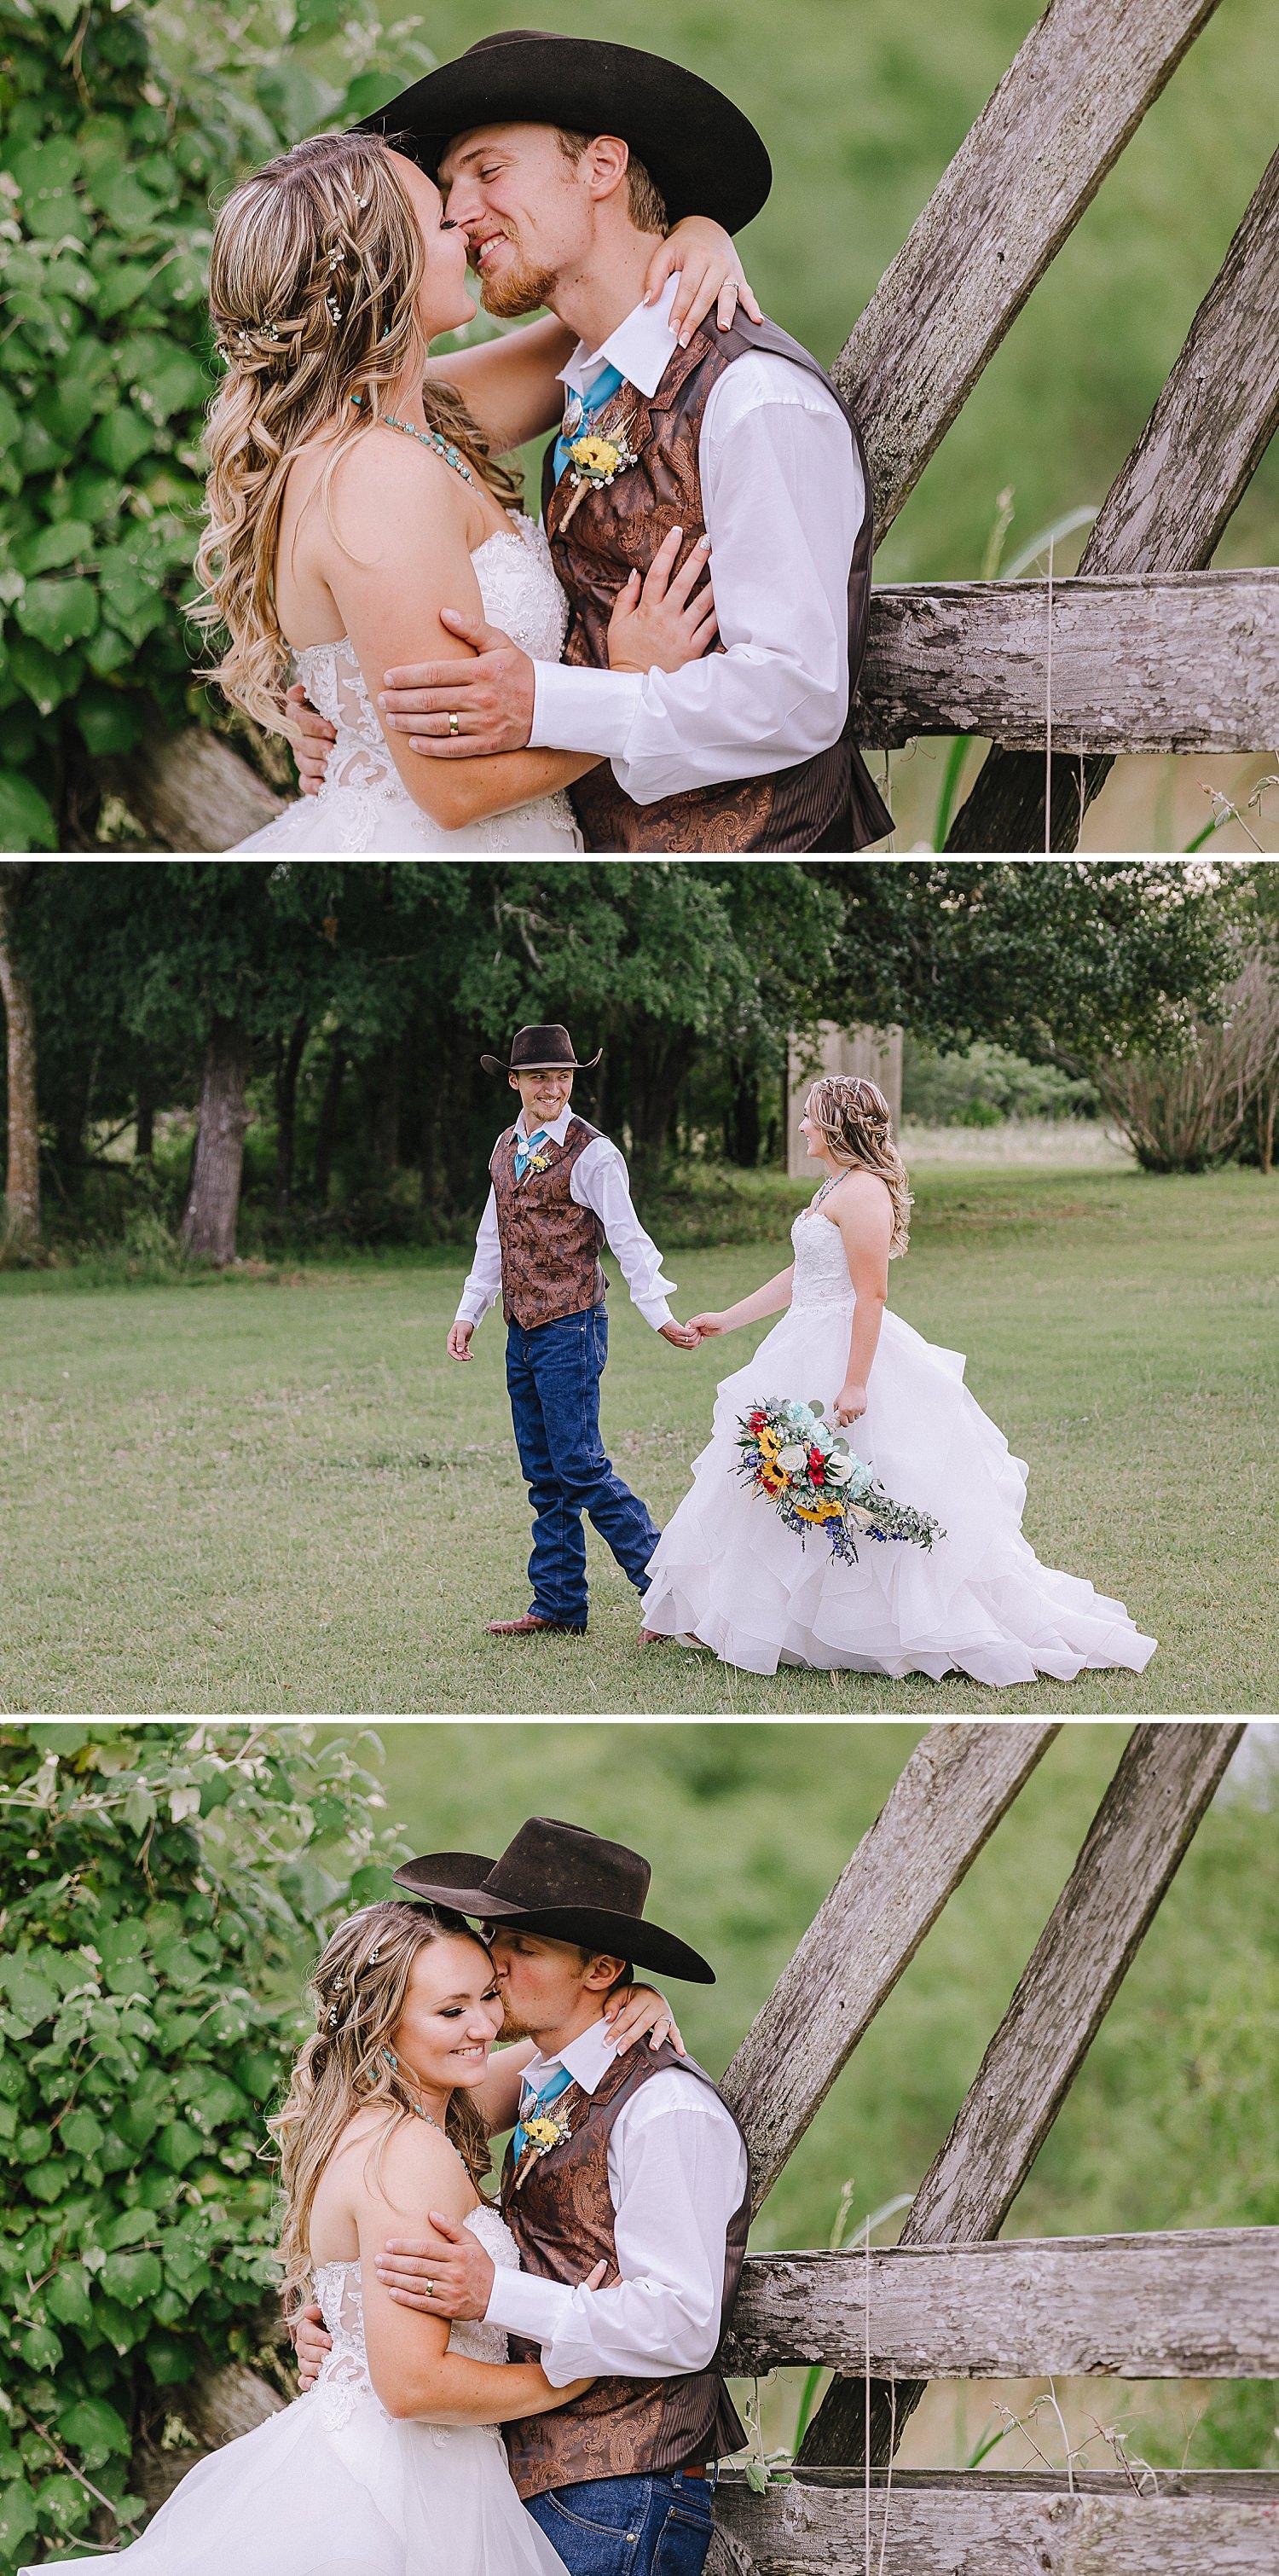 Carly-Barton-Photography-Old-Town-Texas-Rustic-Wedding-Photos-Sunflowers-Boots-Kyle-Texas_0060.jpg